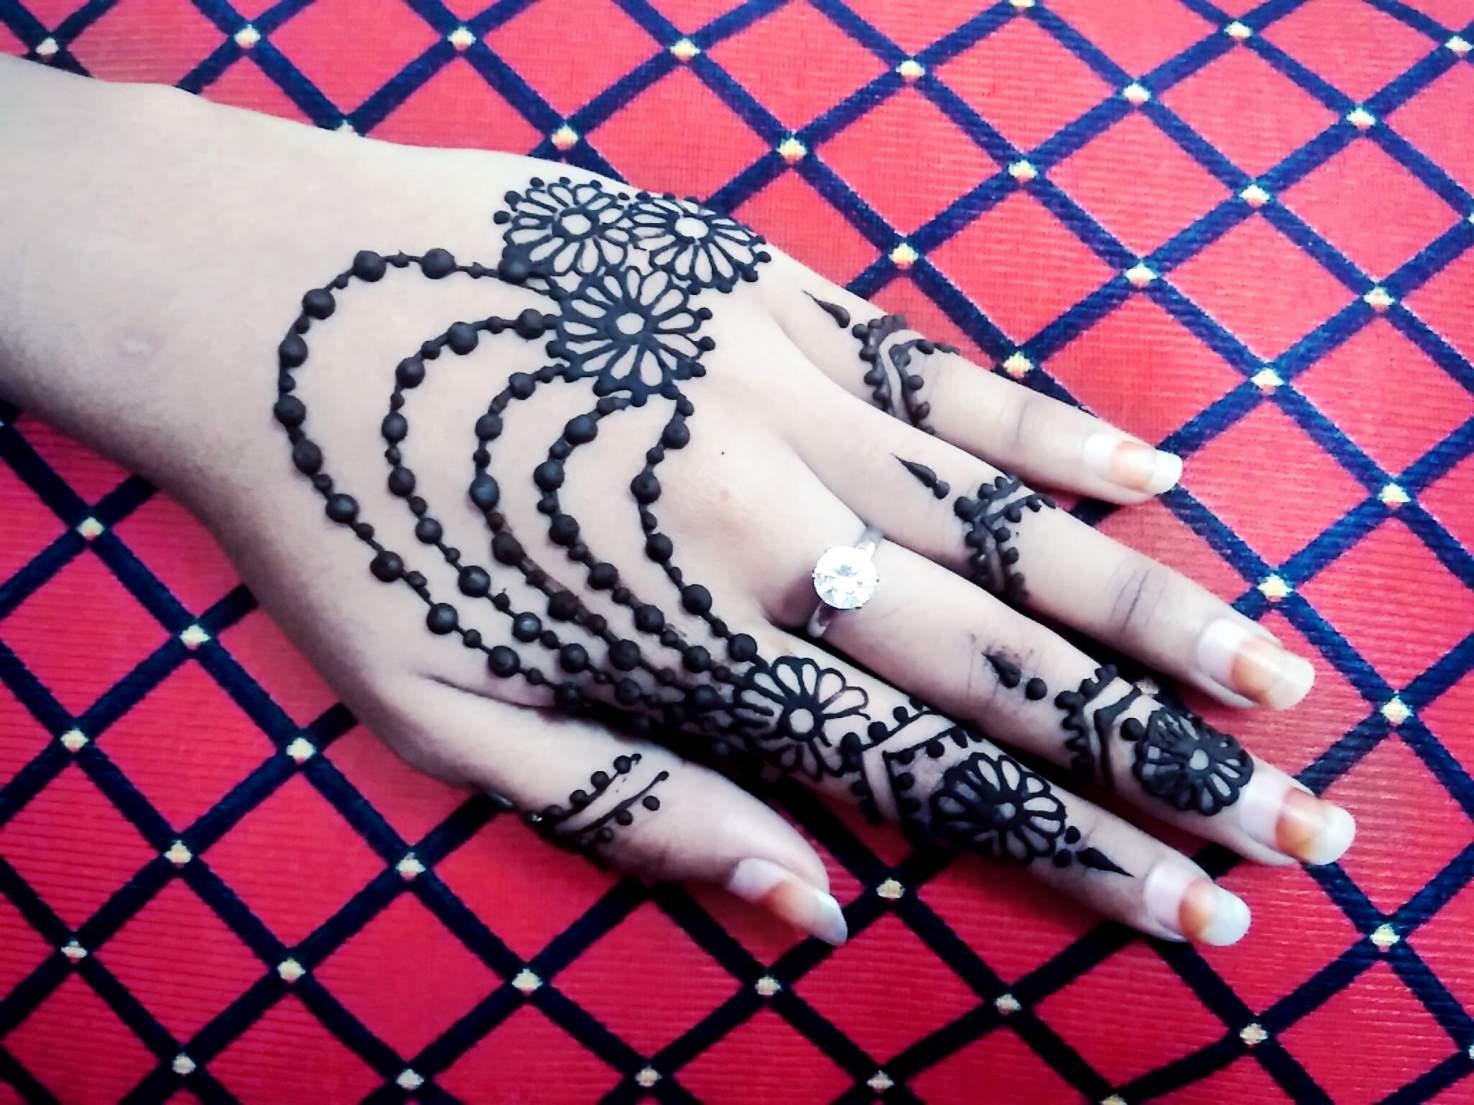 Beautiful Henna Mehndi Jewellery : Mehndi designs archives page of artistica